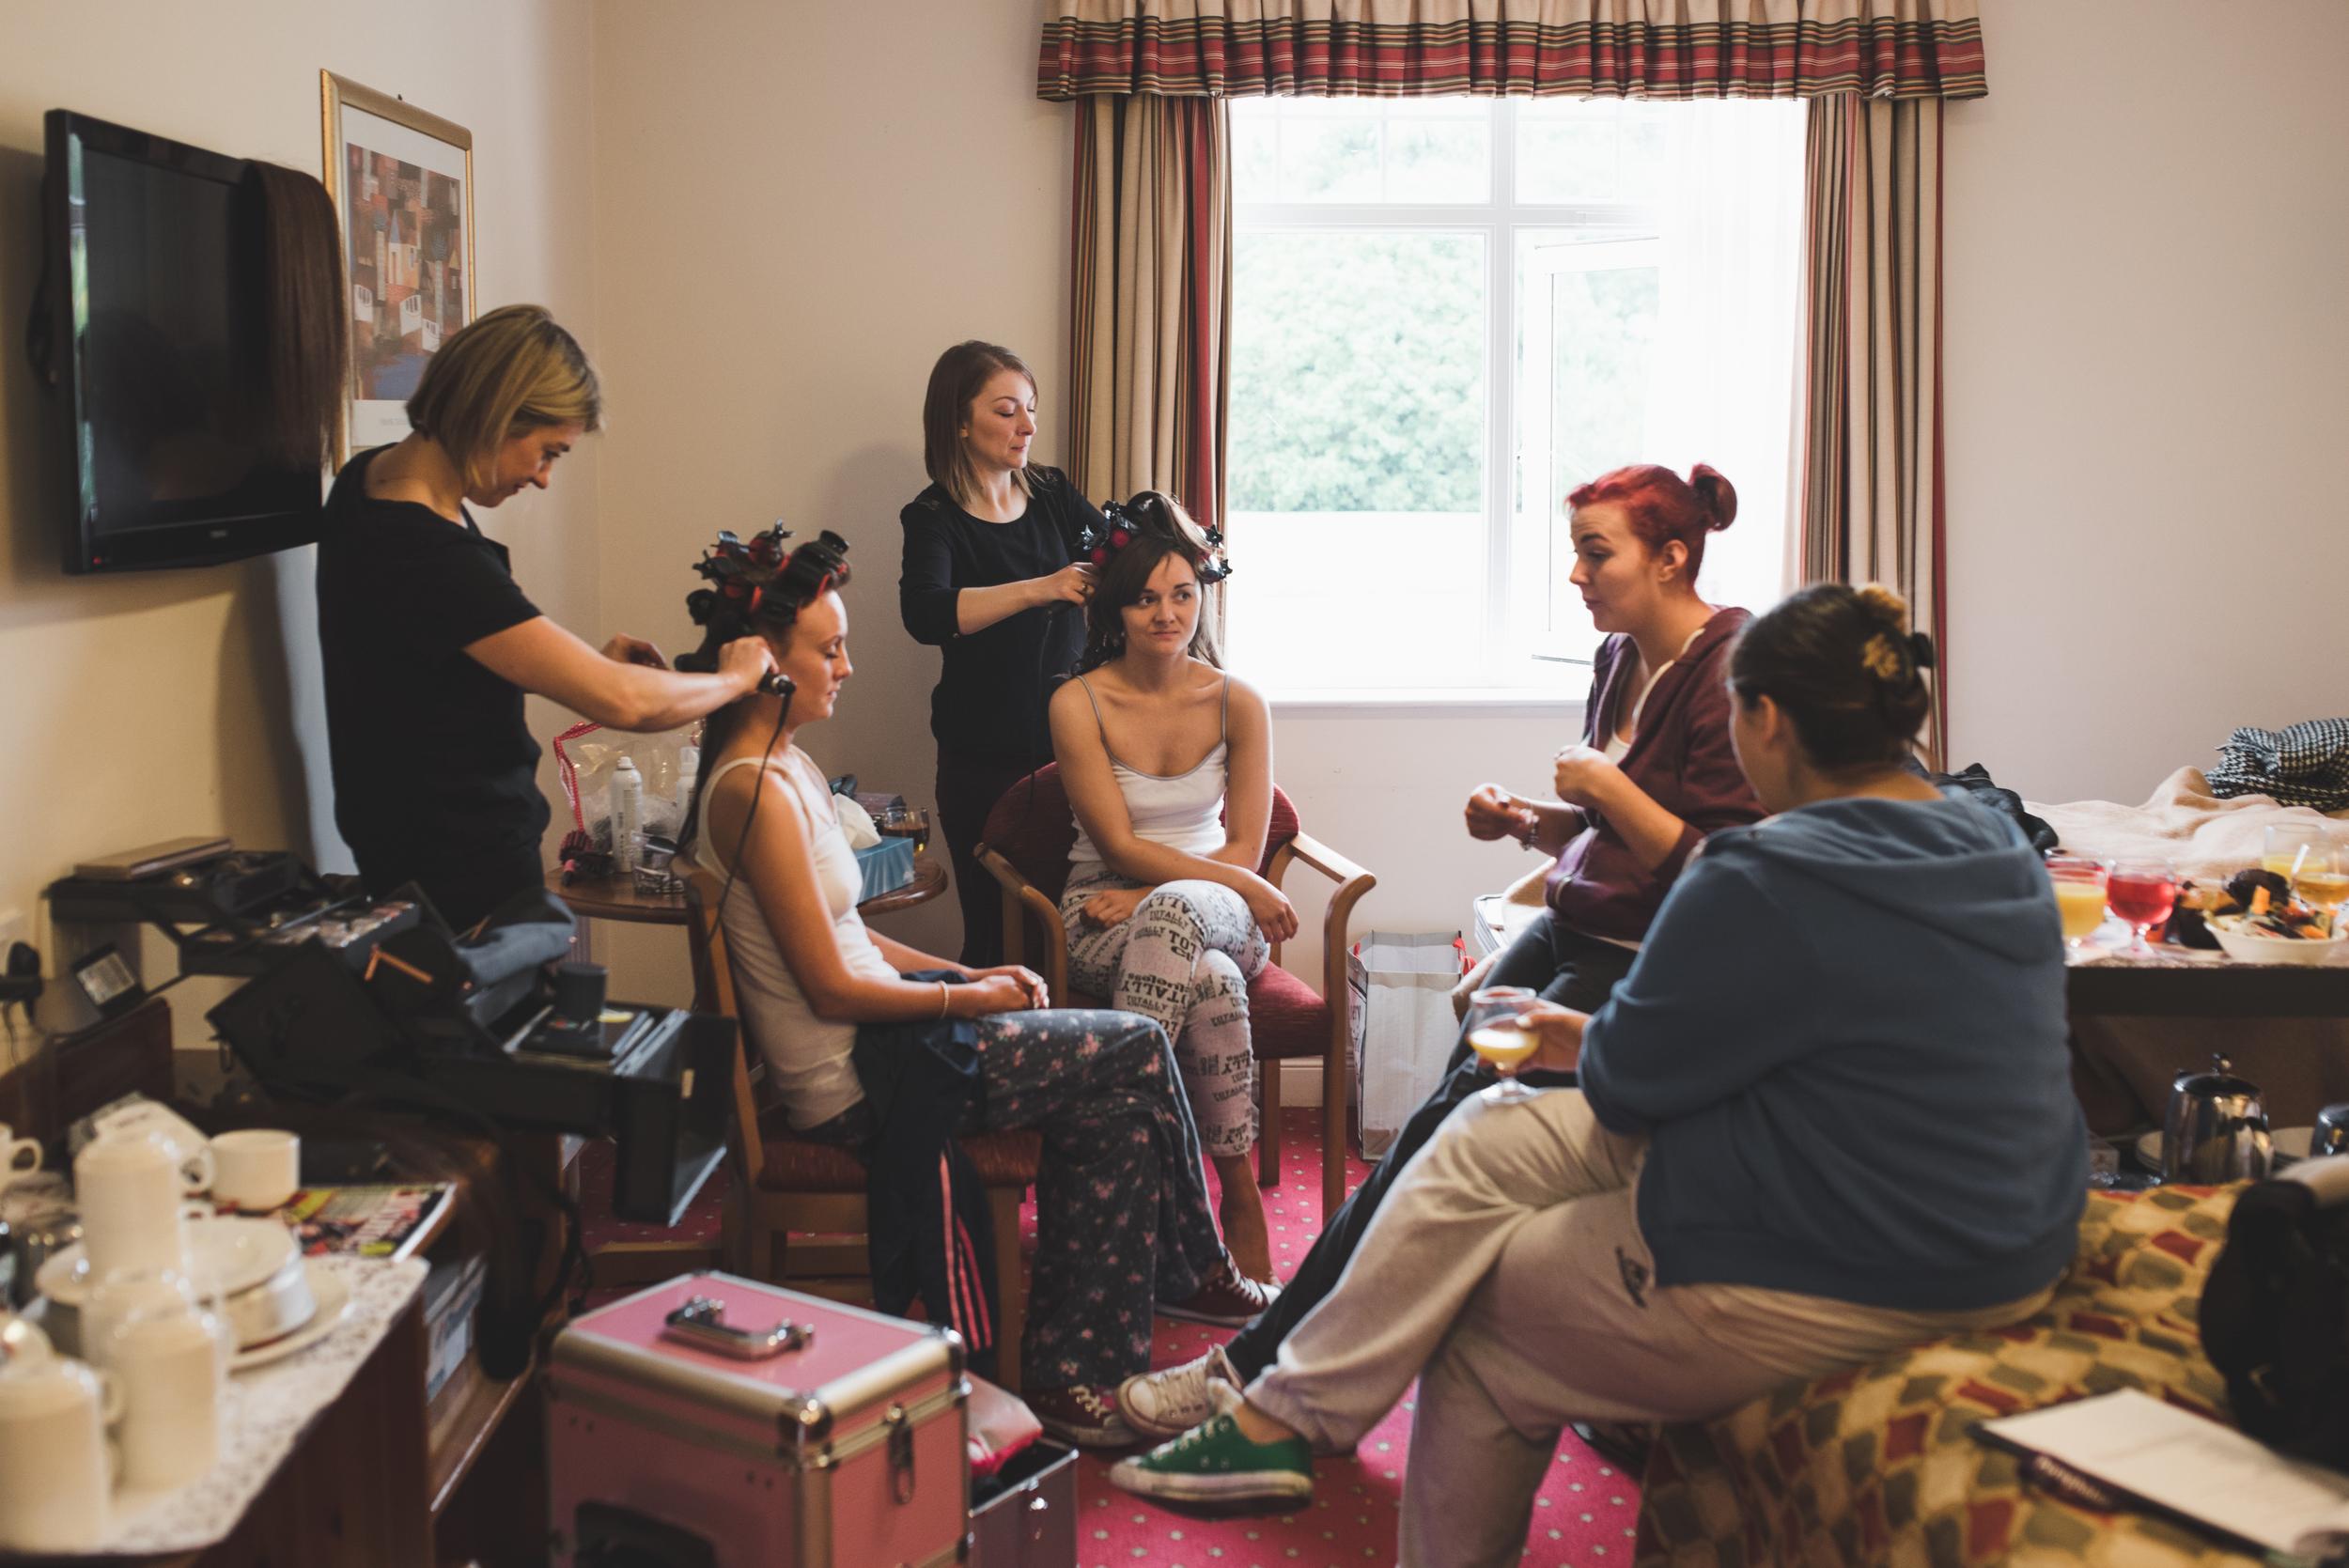 Northern_Ireland_Wedding_Photographer_Purephotoni_Dunsilly_Hotel_Wedding_Hair_Bride_Bridesmaids